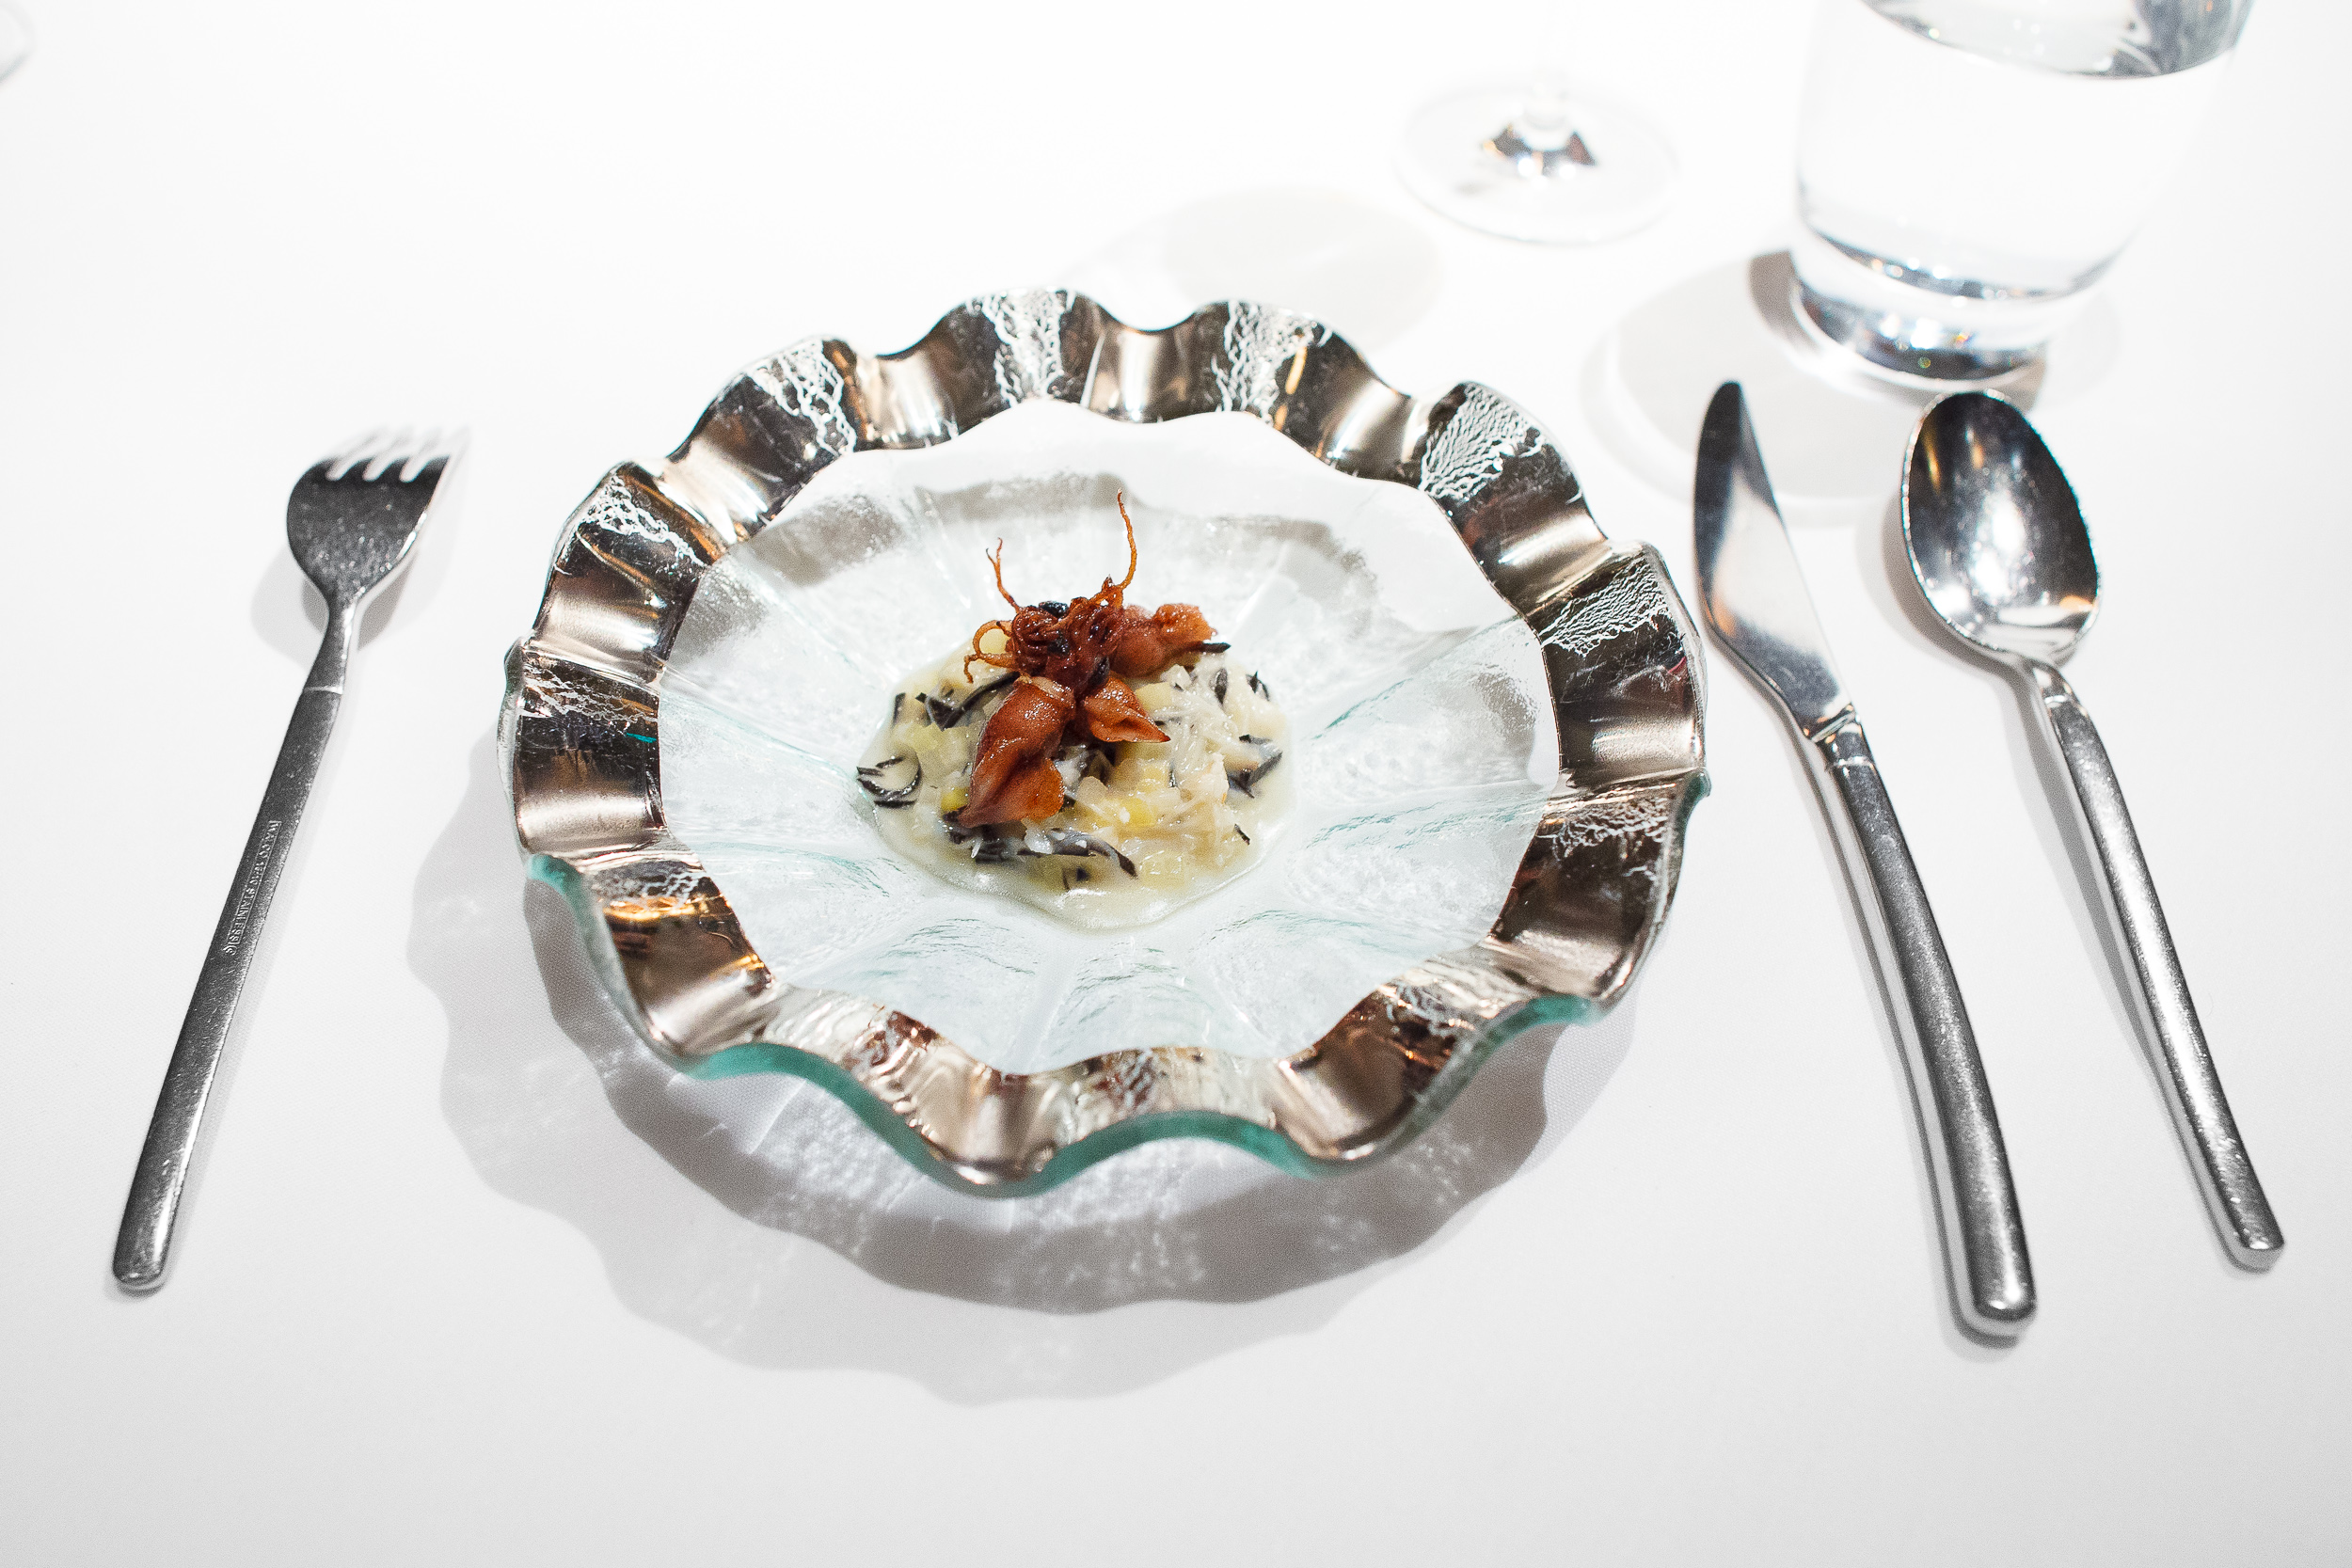 Shellfish risotto without rice, root vegetables / Manresa, Los Gatos, California, United States